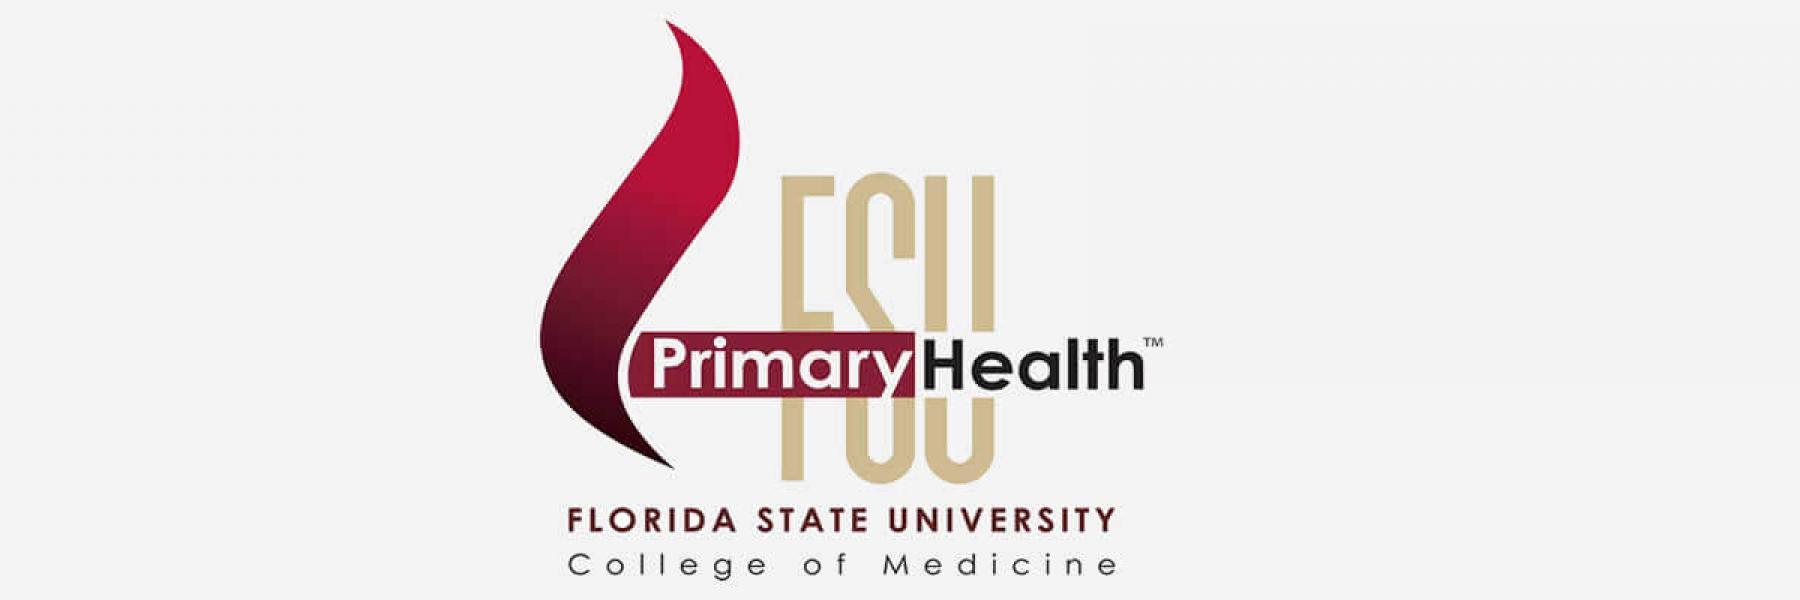 FSU PrimaryHealth™ | College of Medicine